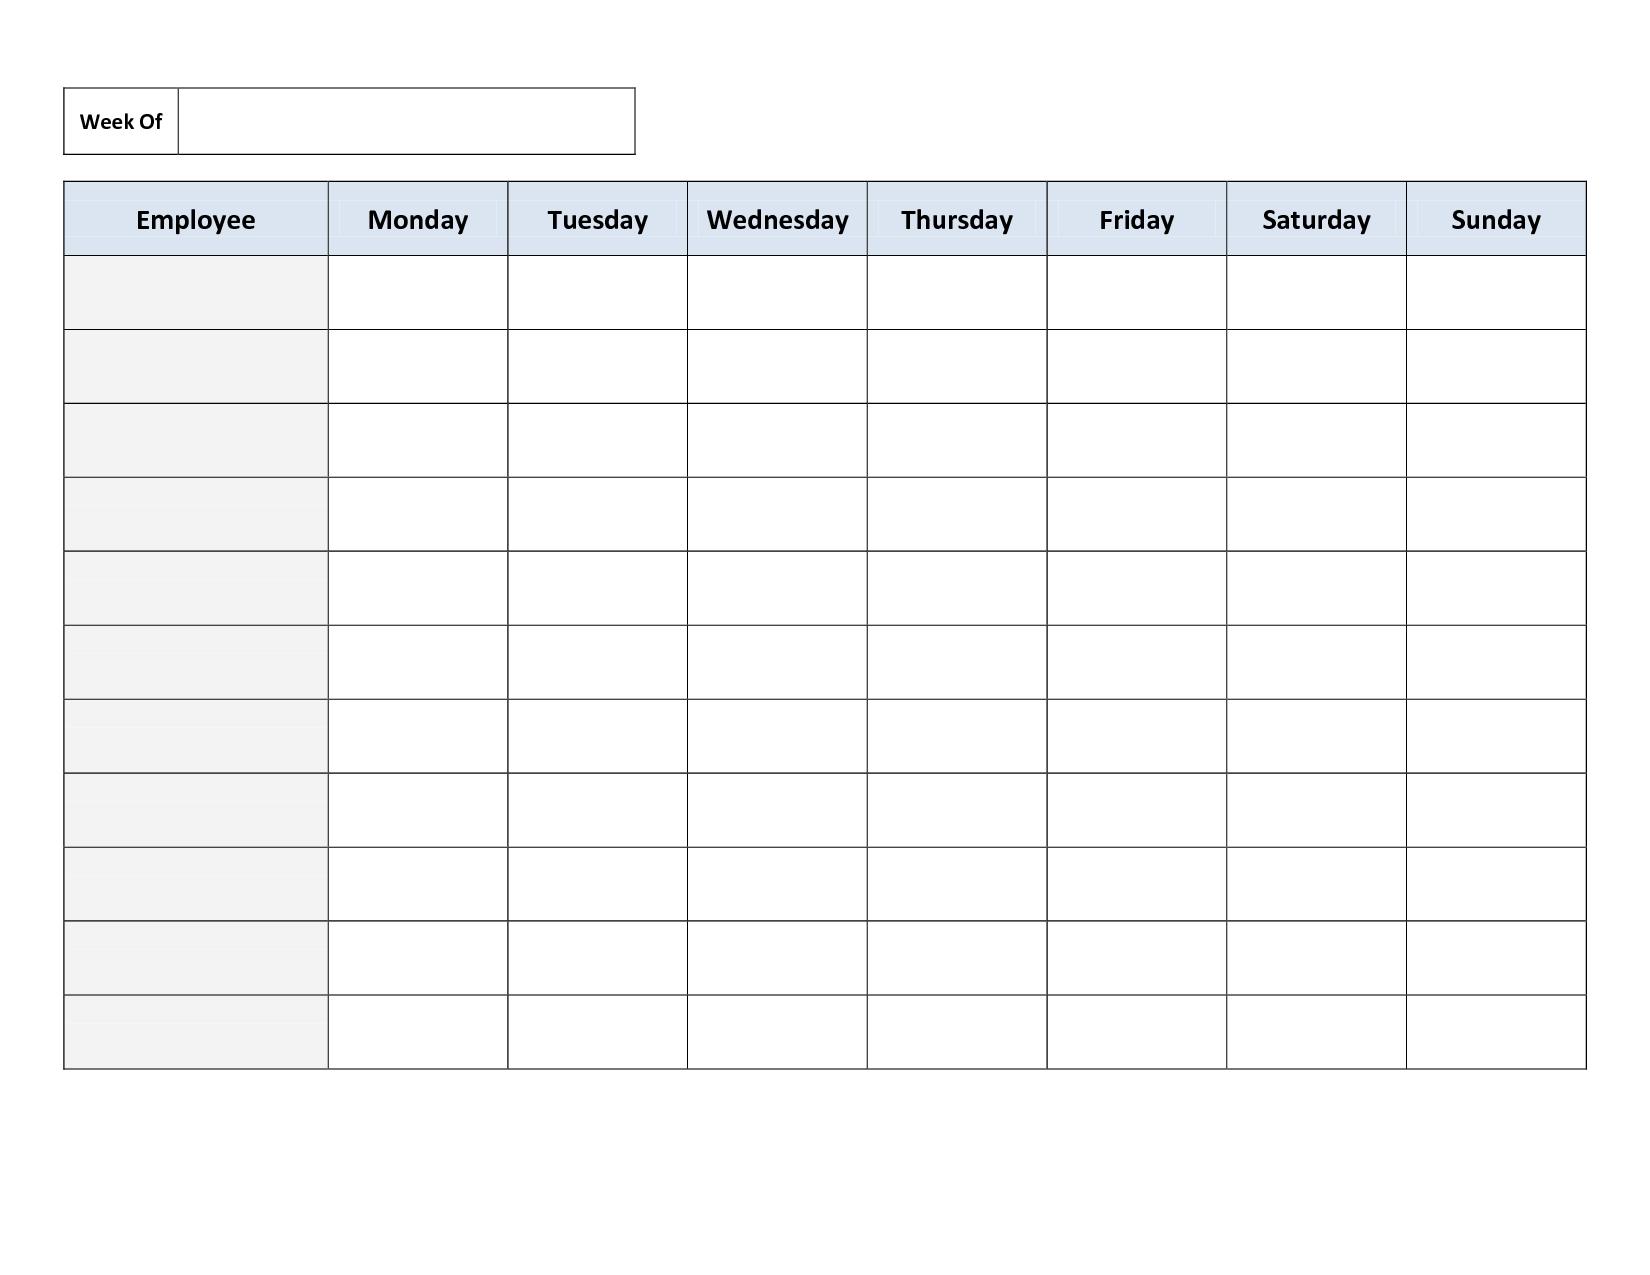 Blank Weekly Work Schedule Template | Schedule | Cleaning Schedule ... Also Employee Work Schedule Spreadsheet